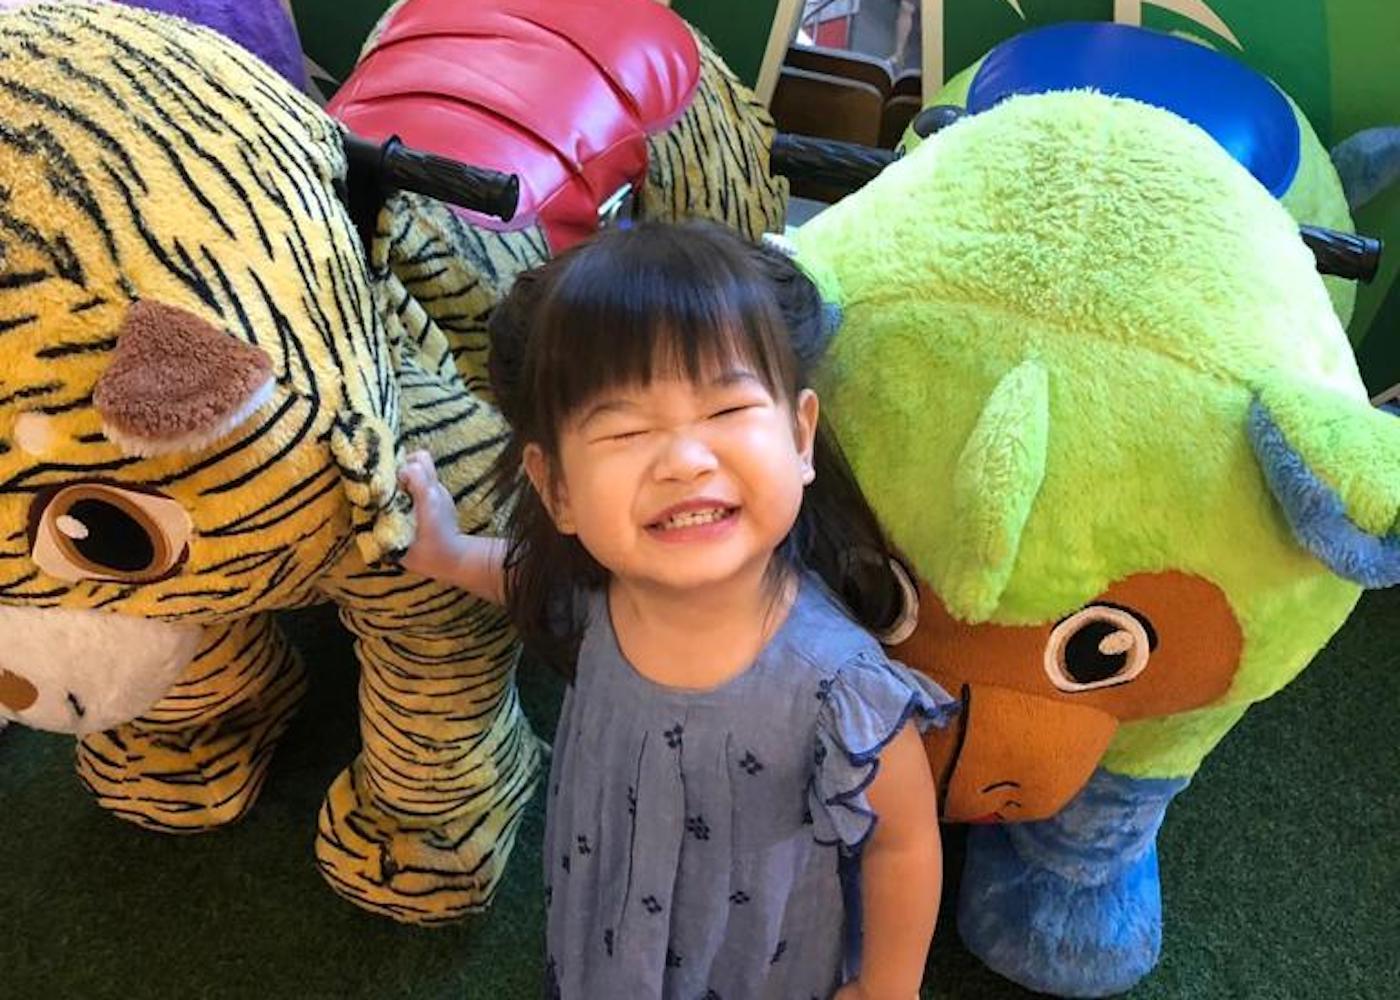 Explore Singapore's most kid-friendly mall